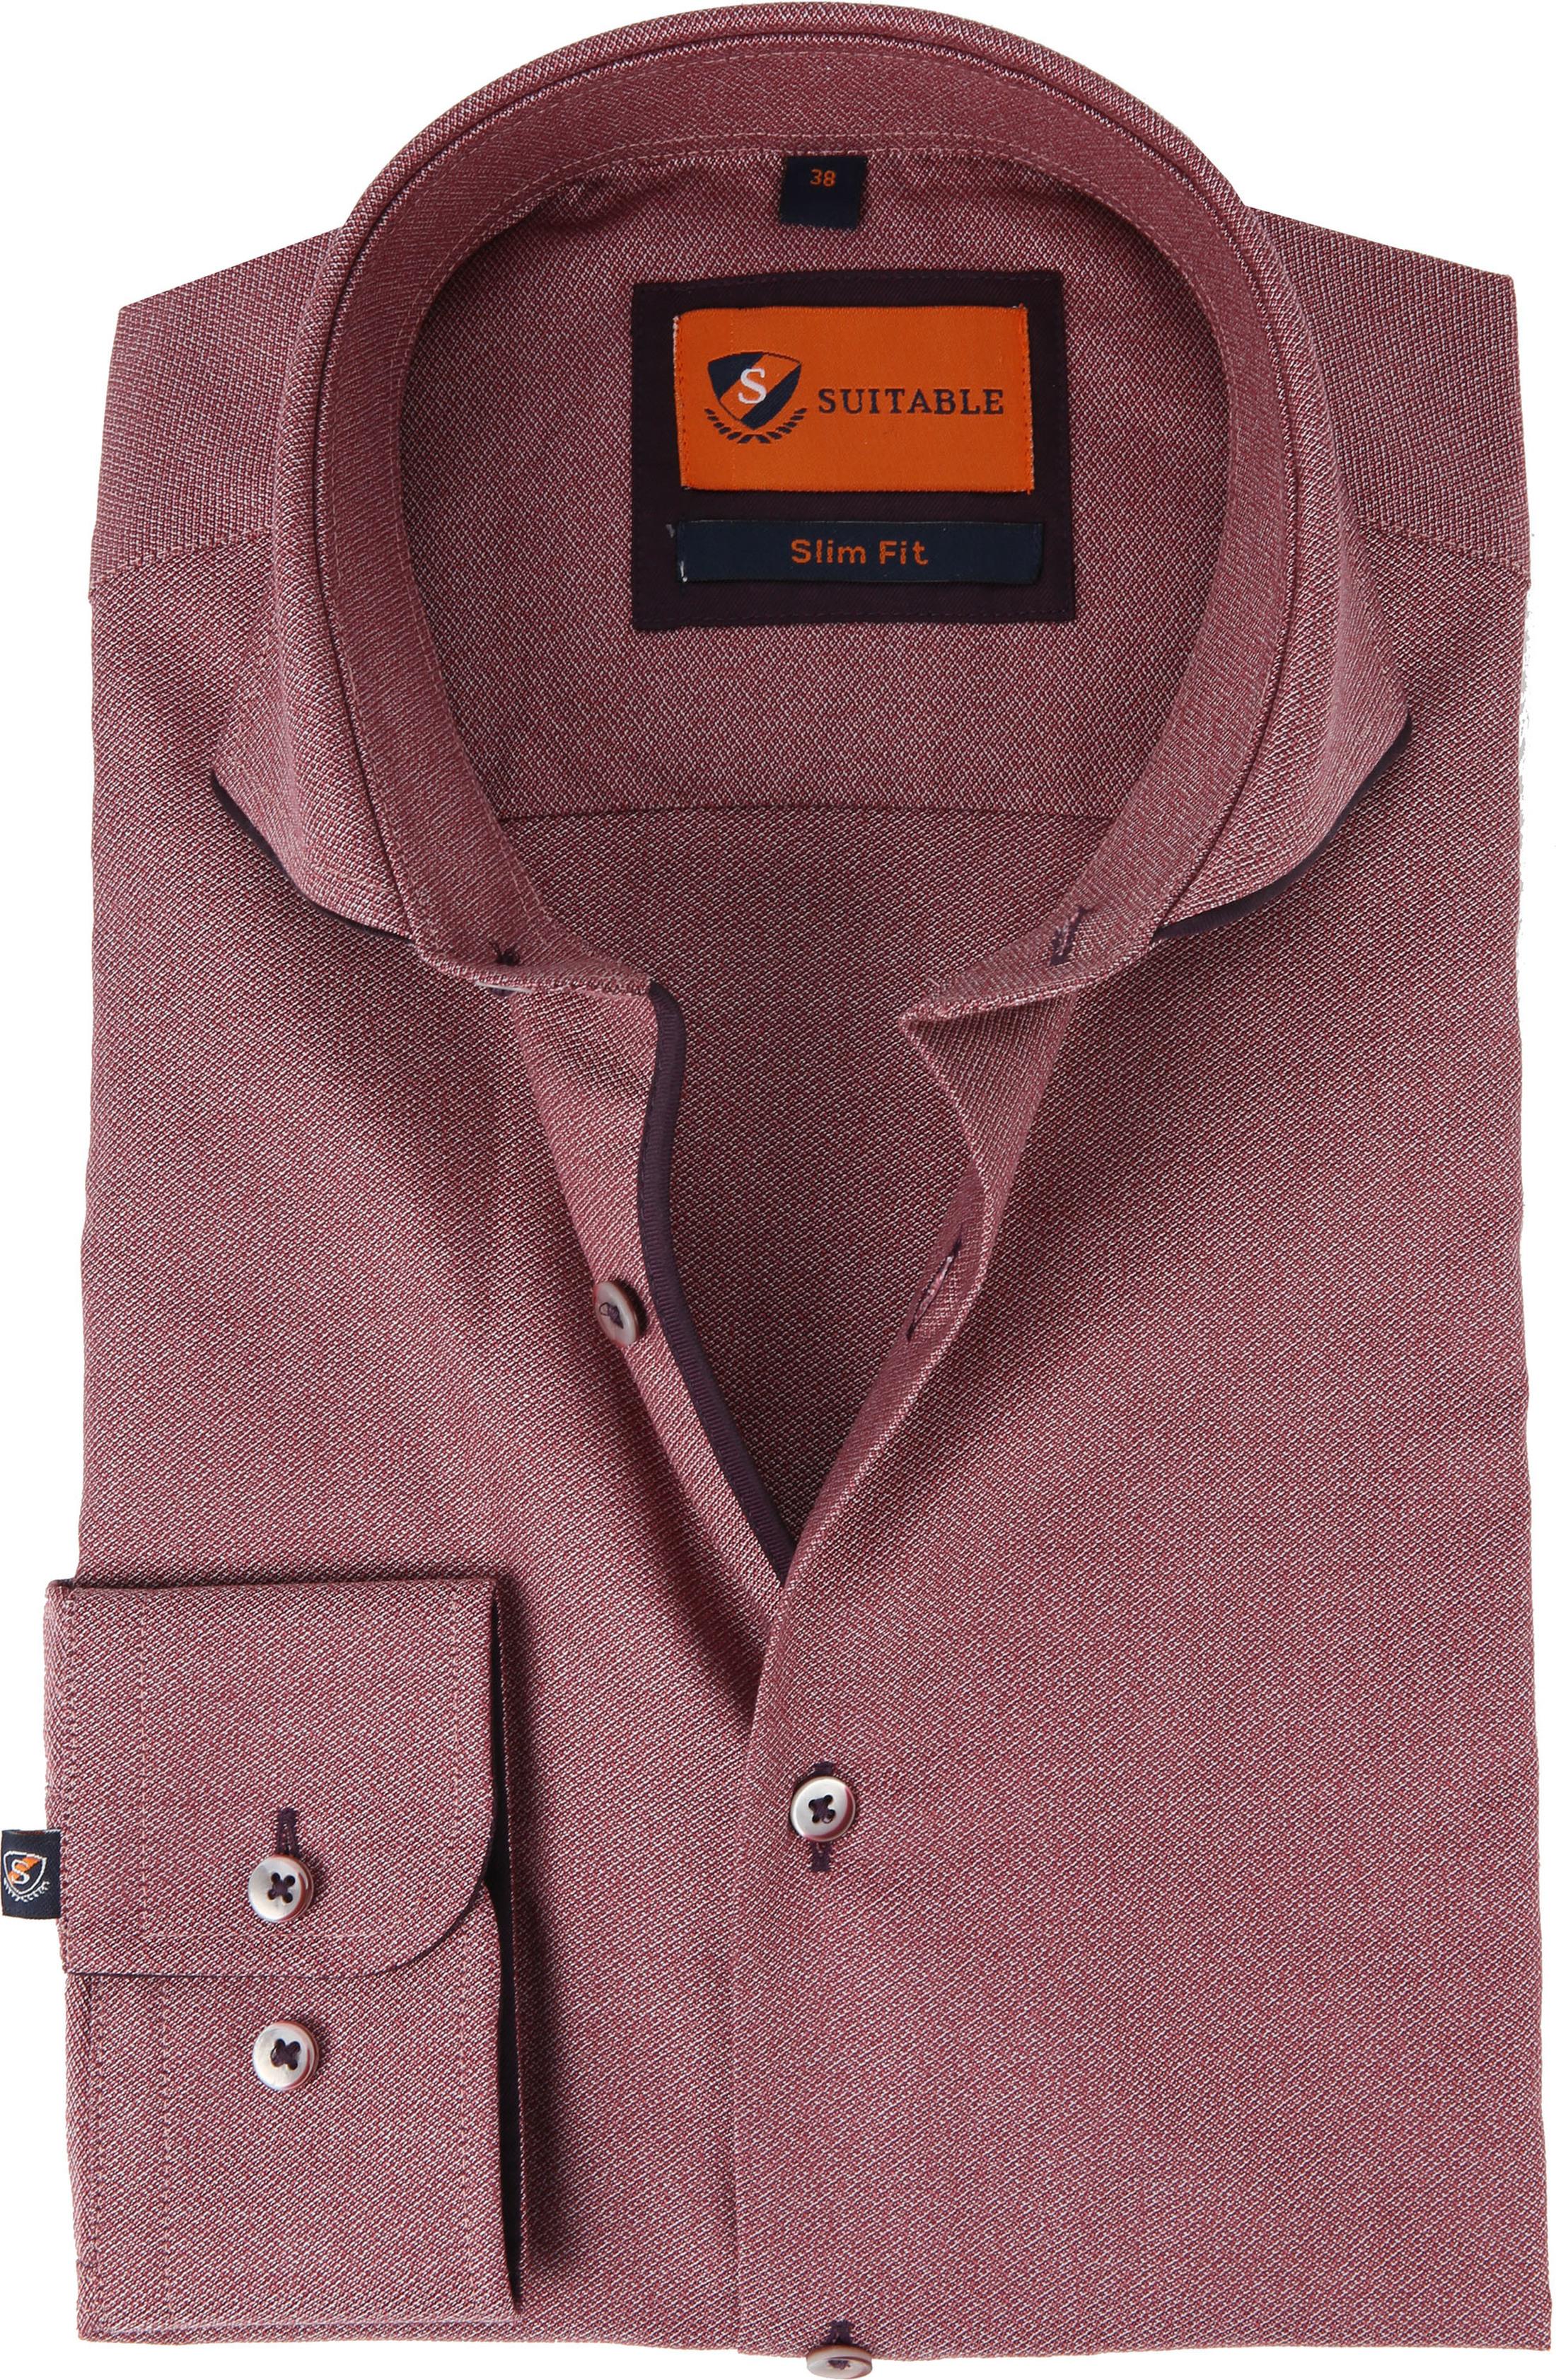 Bordeaux Overhemd.Suitable Overhemd Mouline Bordeaux 192 3 Caw Tip Online Bestellen